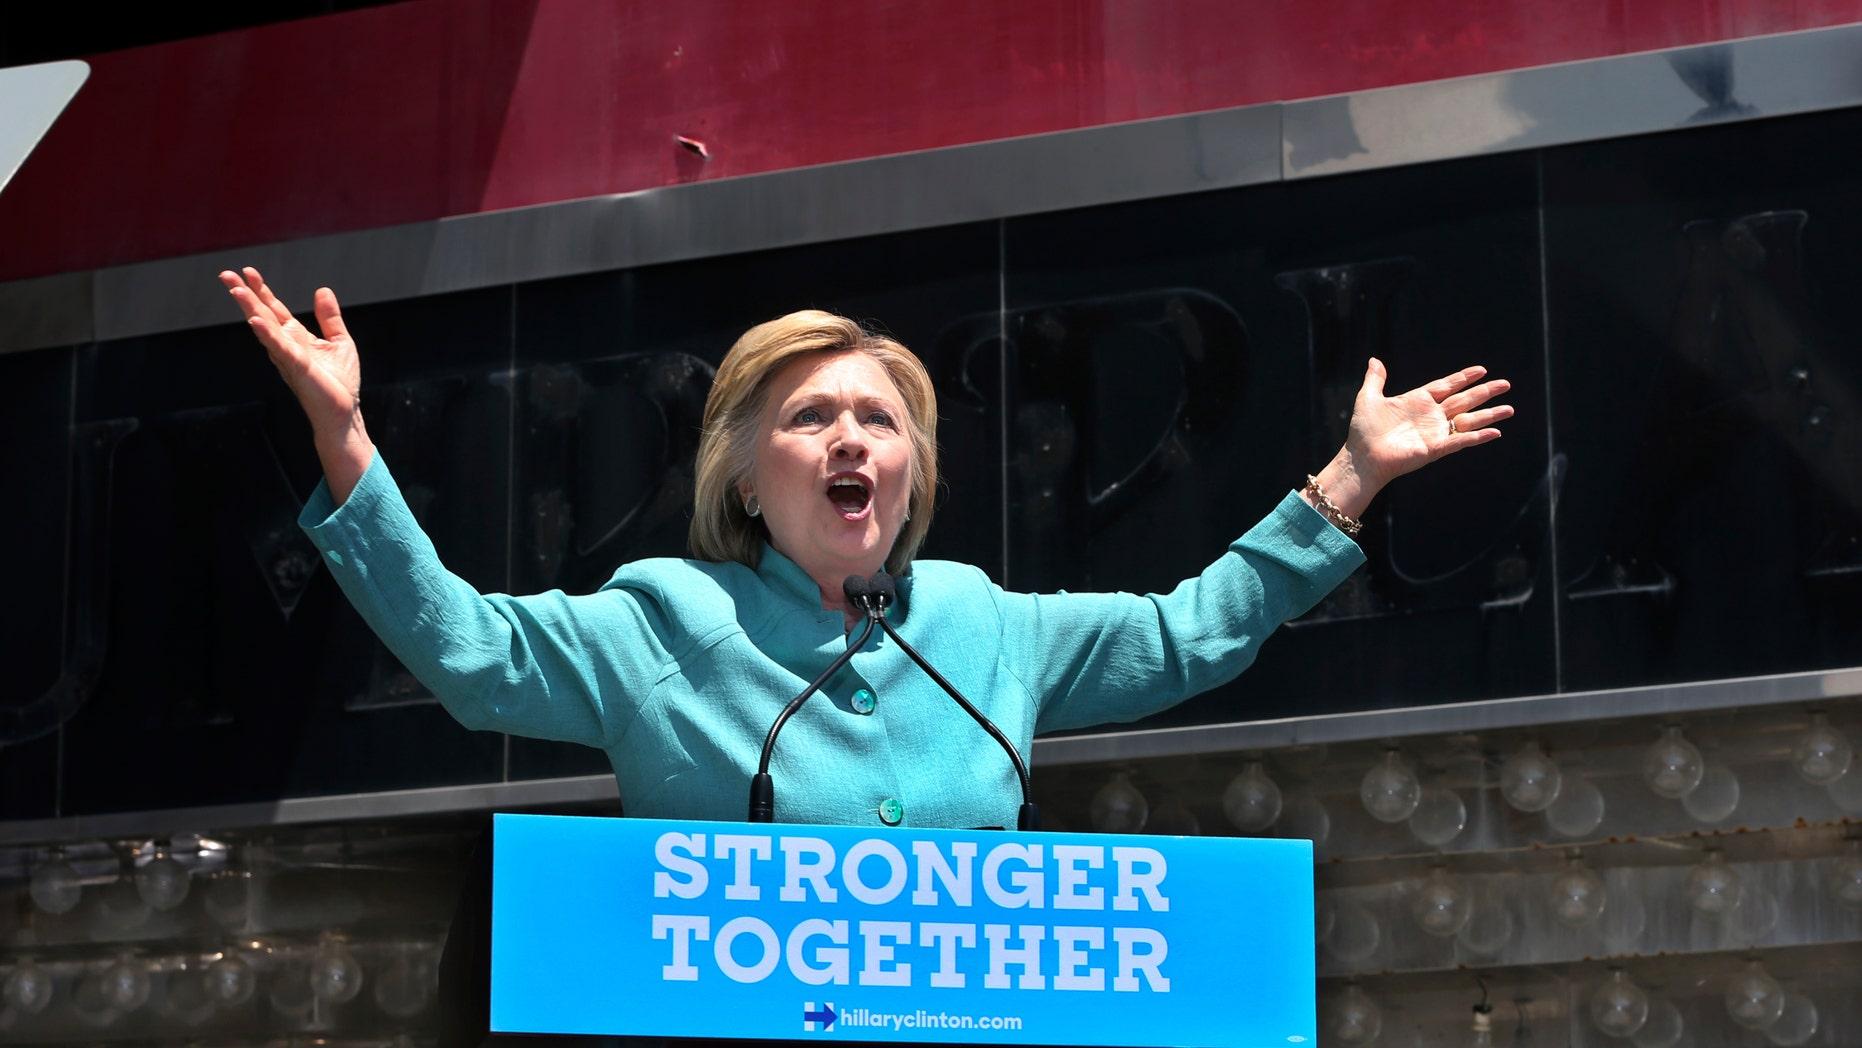 Democratic presidential candidate Hillary Clinton speaks on the Boardwalk in Atlantic City, N.J.,Wednesday, July 6, 2016.